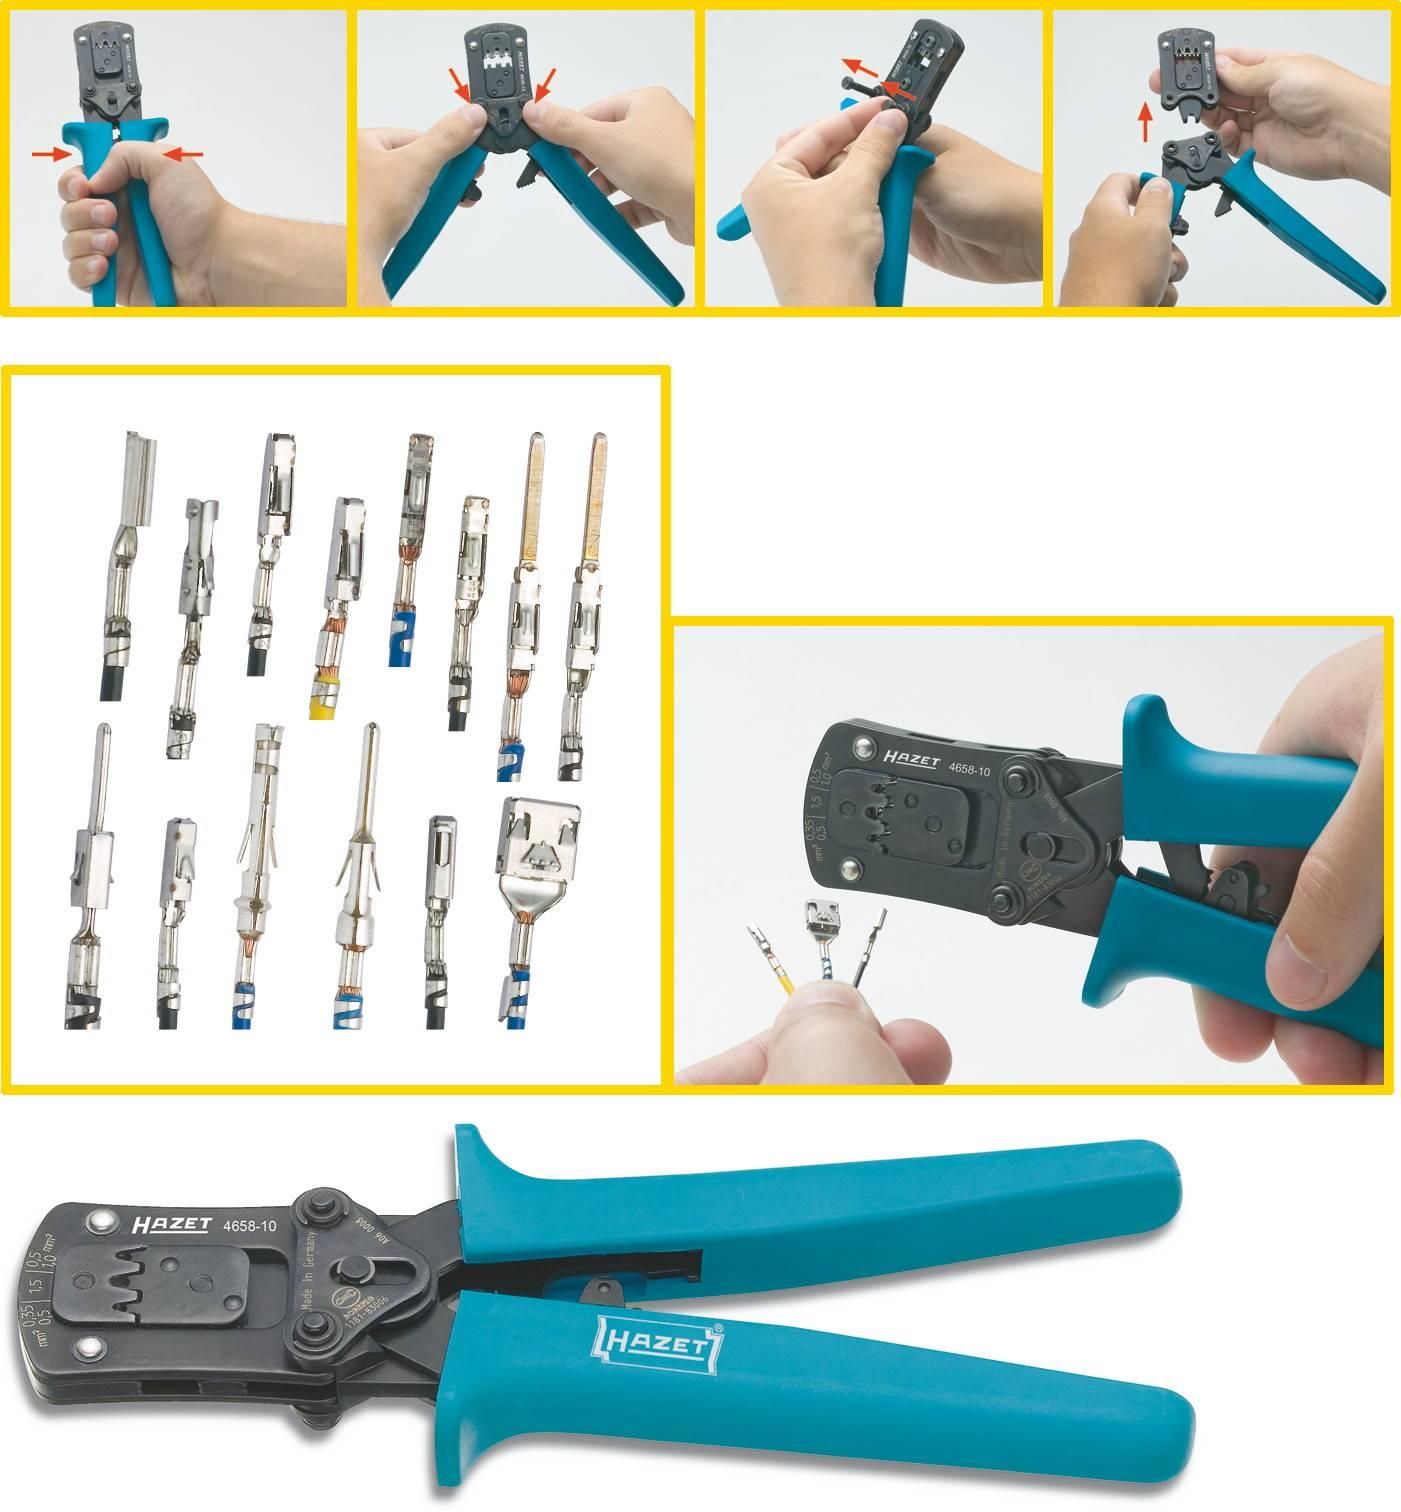 Hazet 4658-10 Crimping pliers